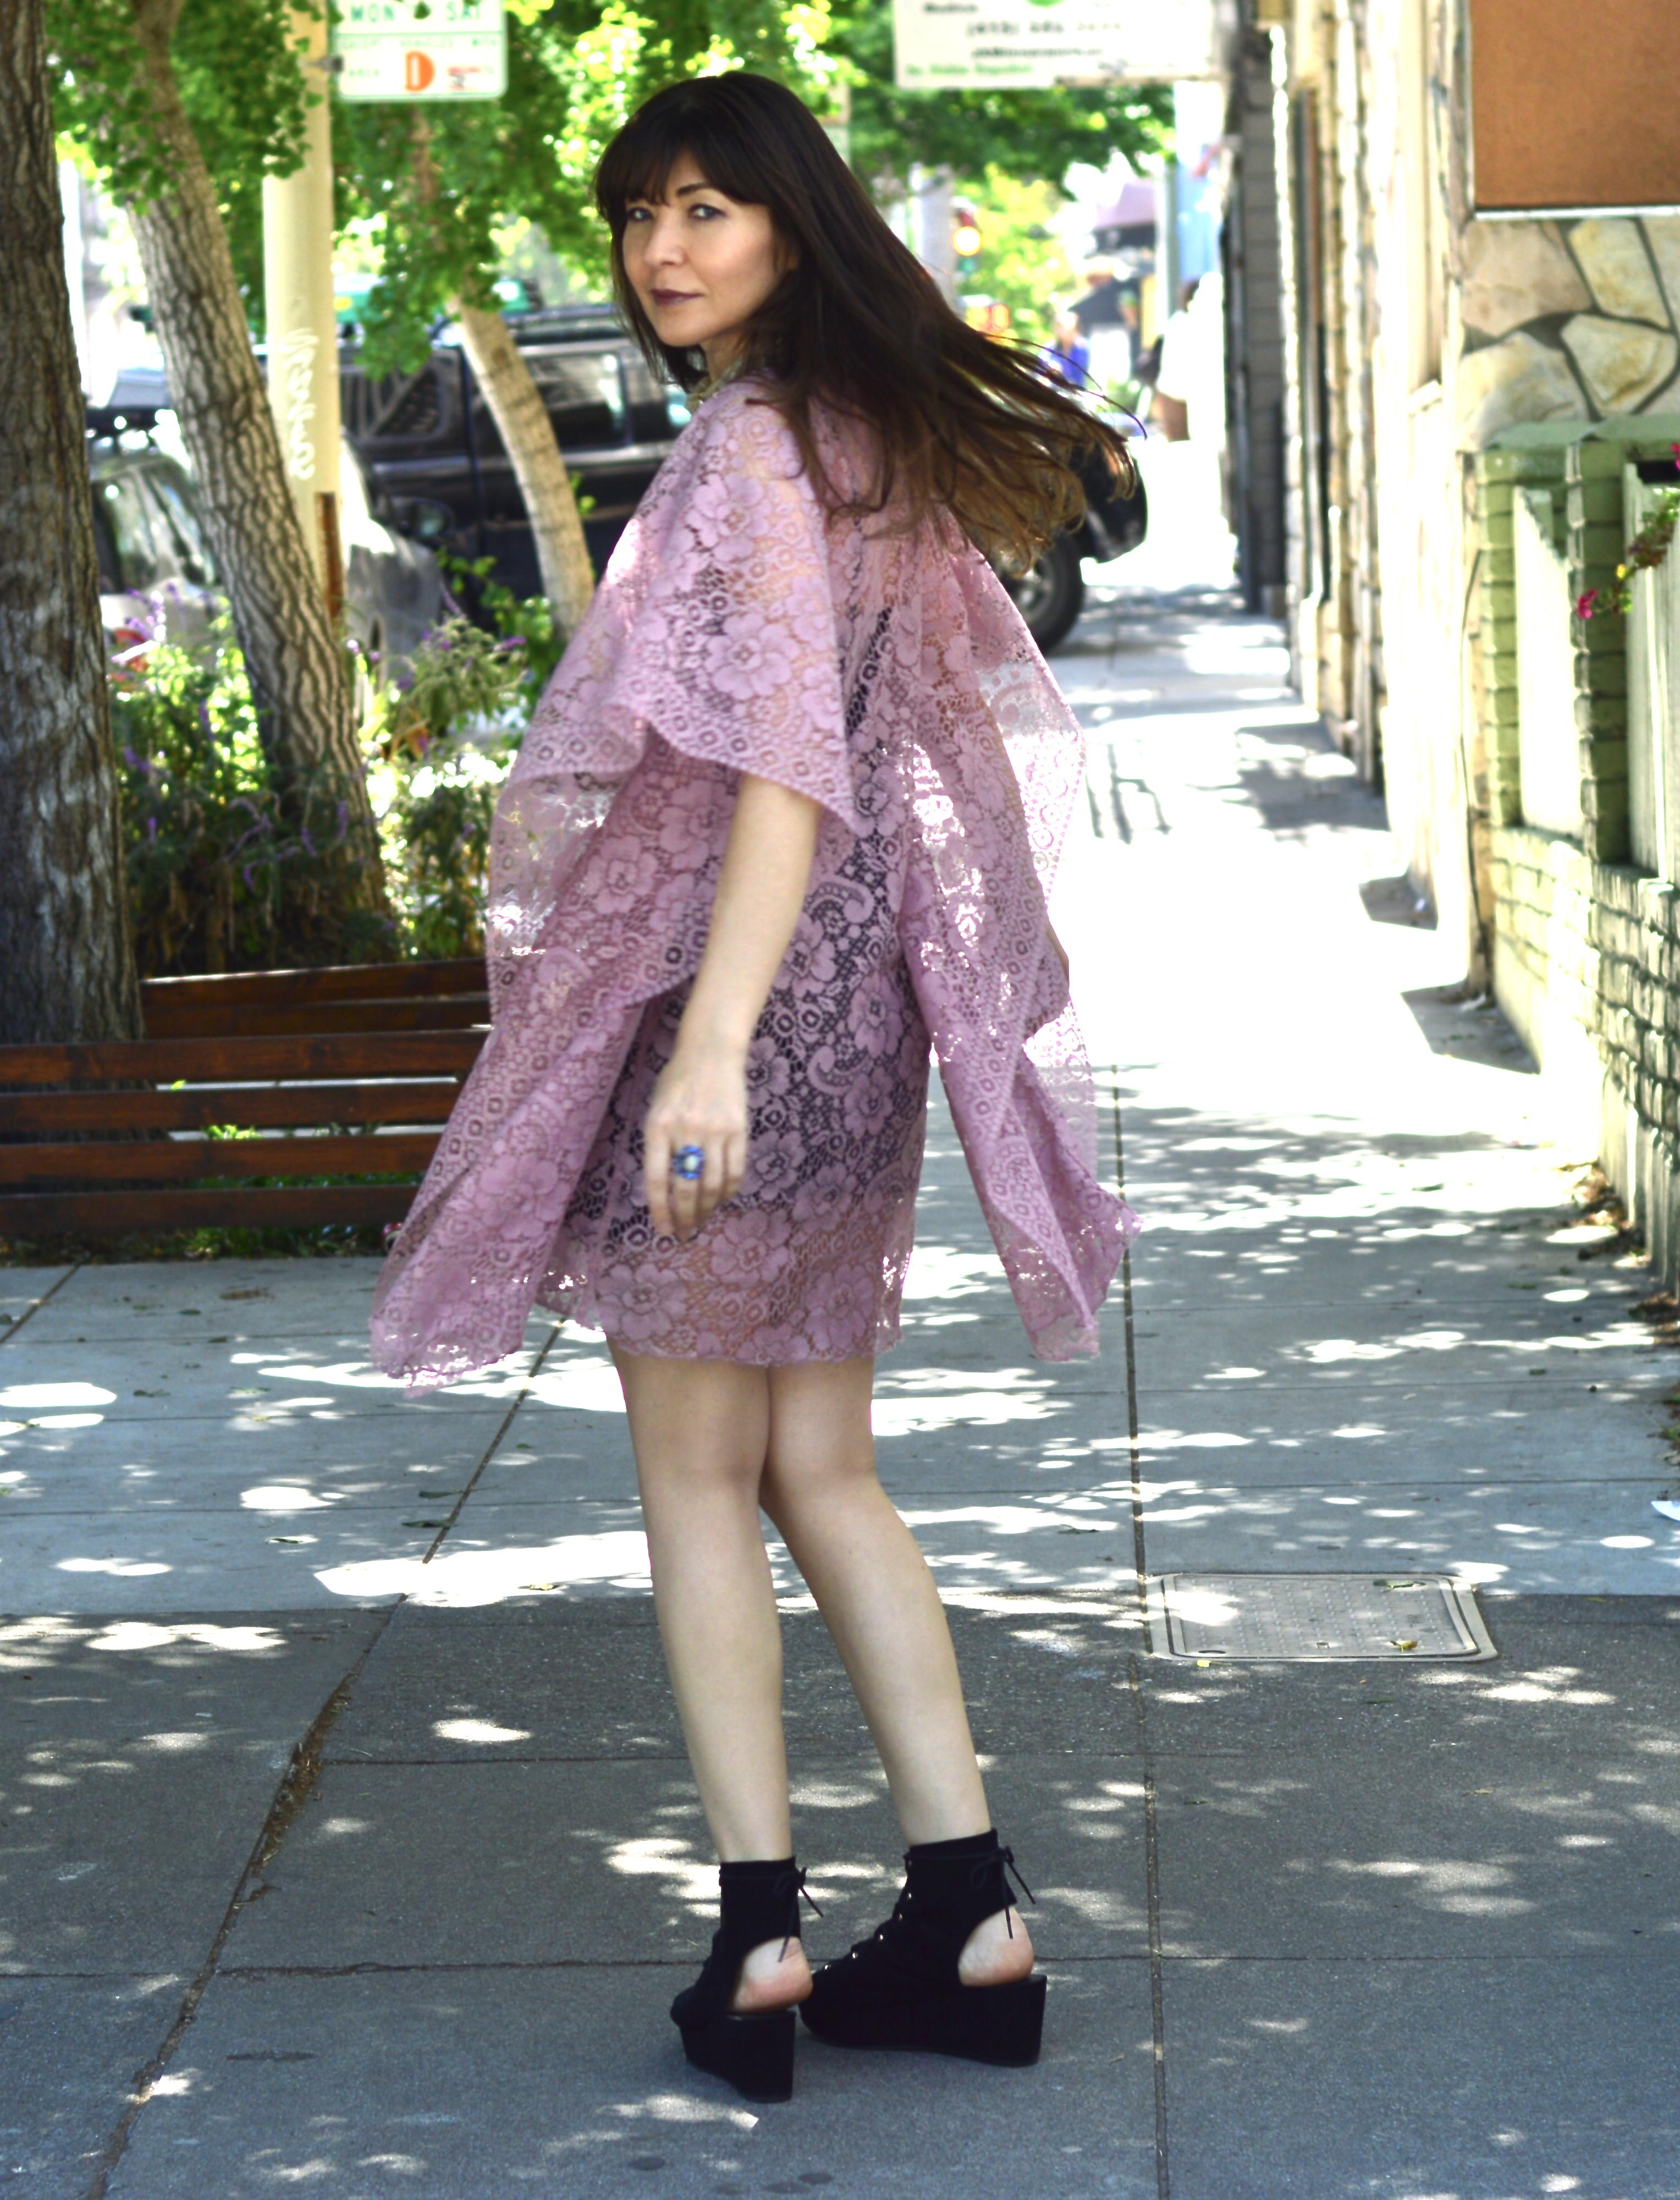 Lace dress and Sasha Maks Vintage rhinestone jewelry.